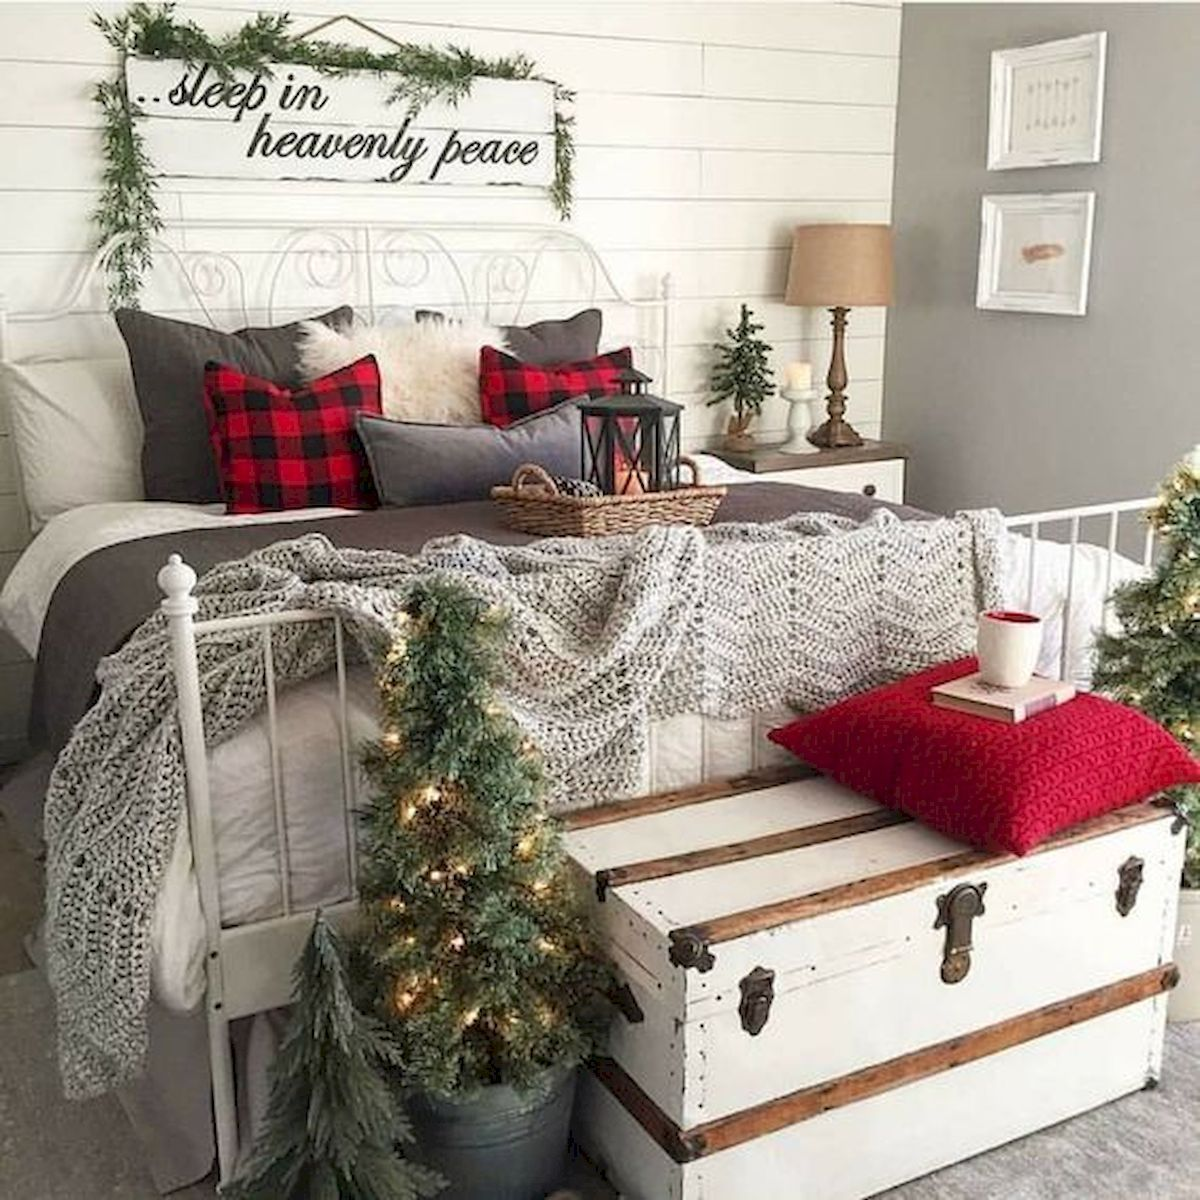 40 Awesome Bedroom Christmas Decor Ideas Christmas Room